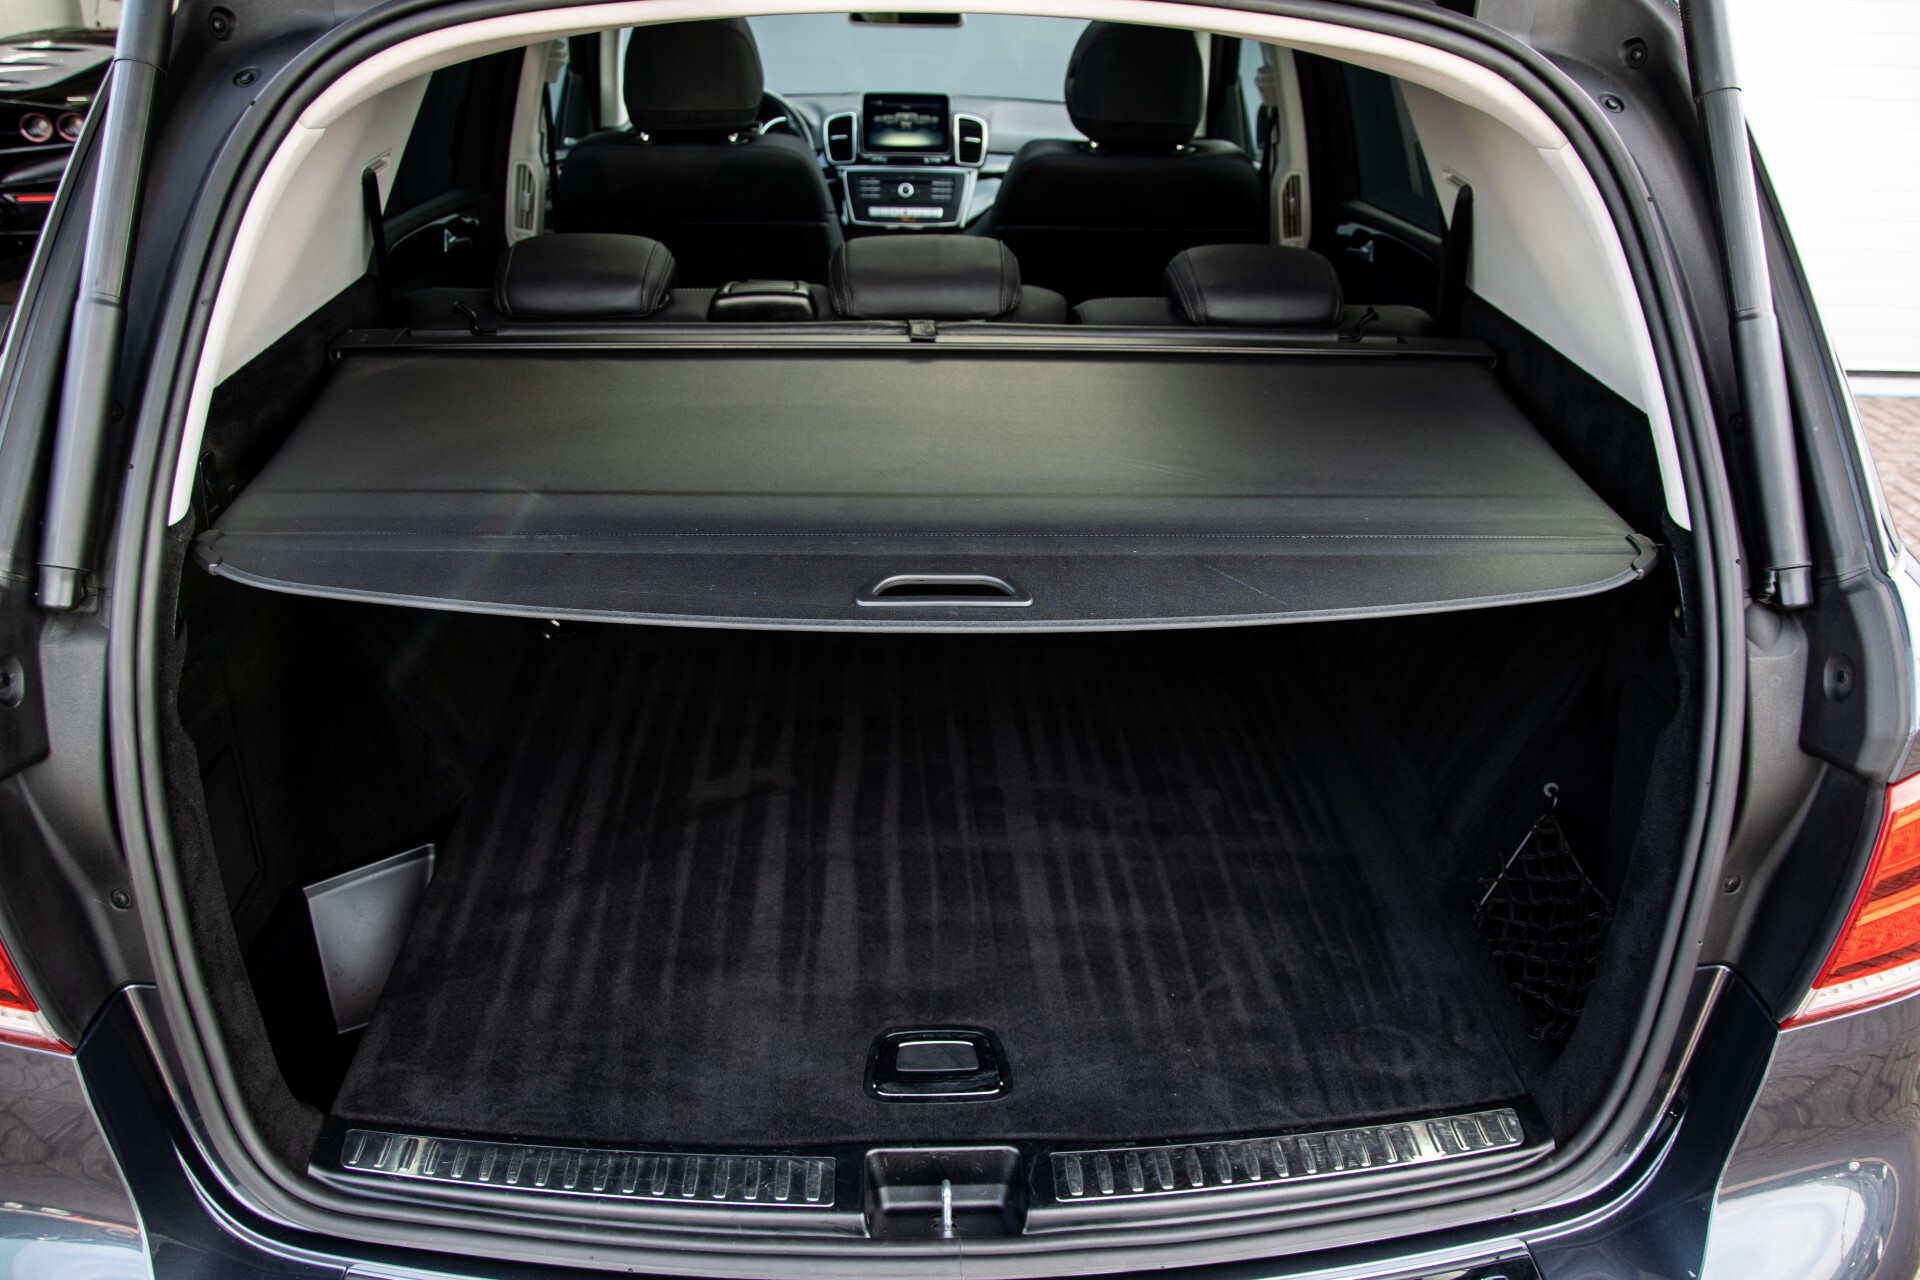 Mercedes-Benz GLE 350 d 4-M AMG Active Curve System/Panorama/Standkachel/Harman-Kardon/Trekhaak Aut9 Foto 55